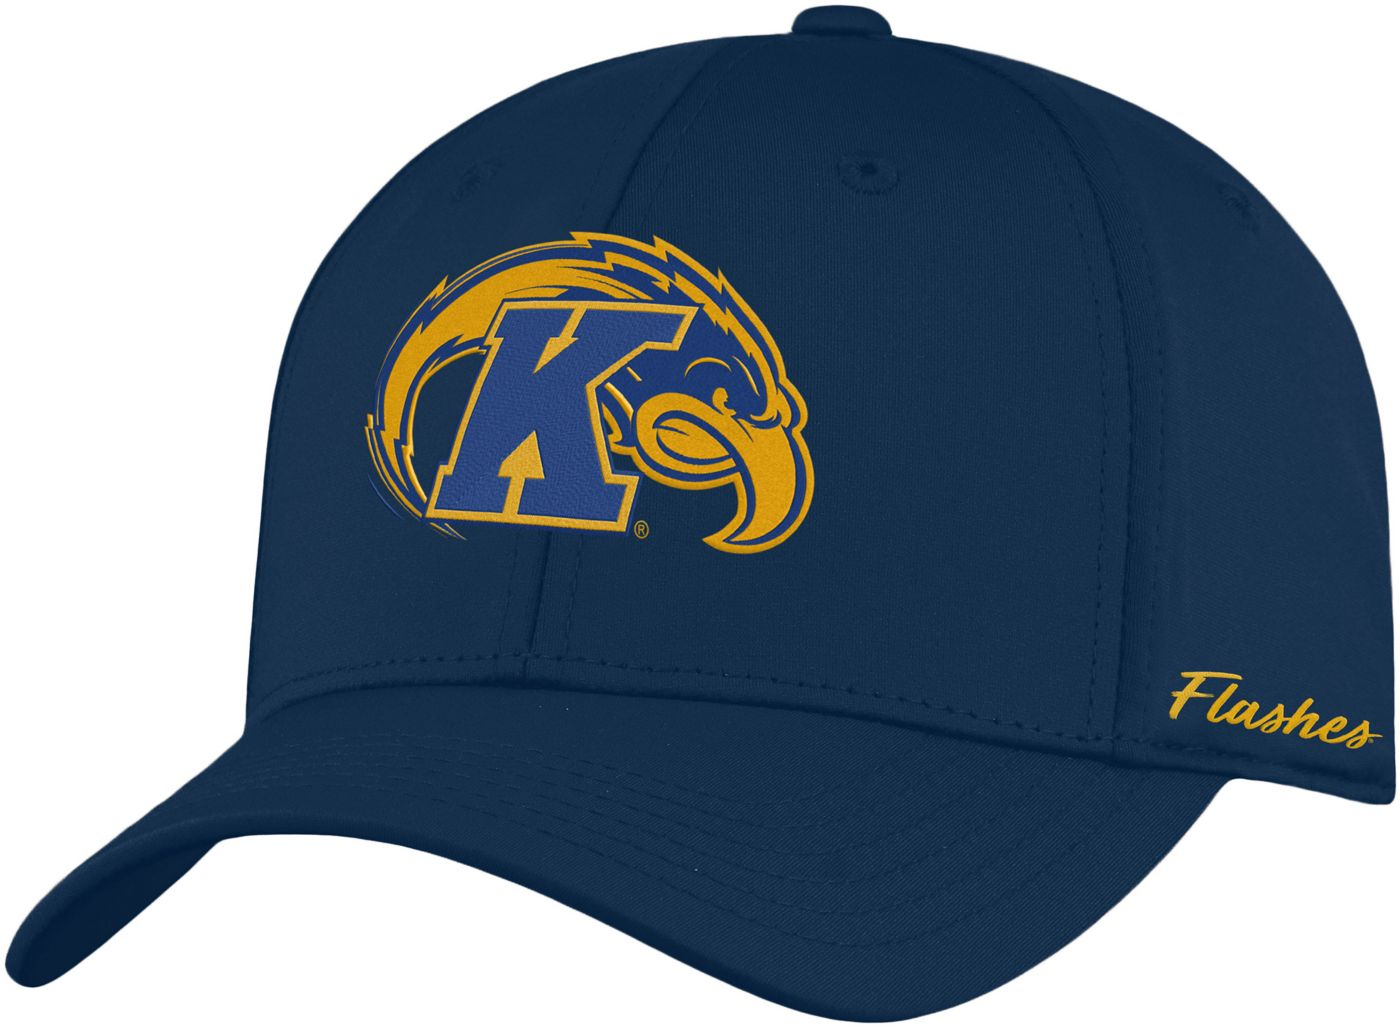 Top of the World Men's Kent State Golden Flashes Navy Blue Phenom 1Fit Flex Hat